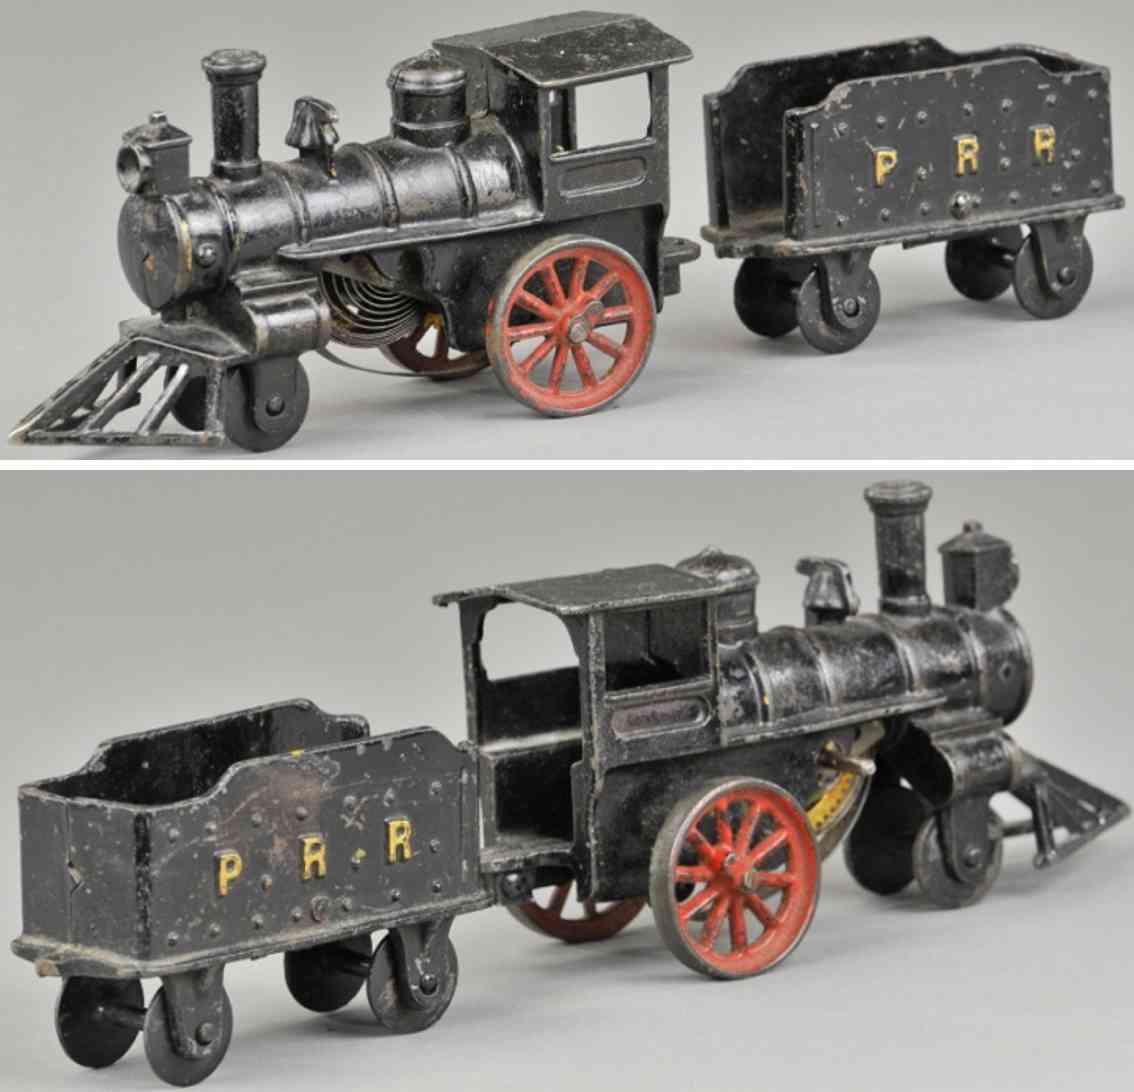 hubley railway toy floor train clockwork locomotiveprr tender cast iron black